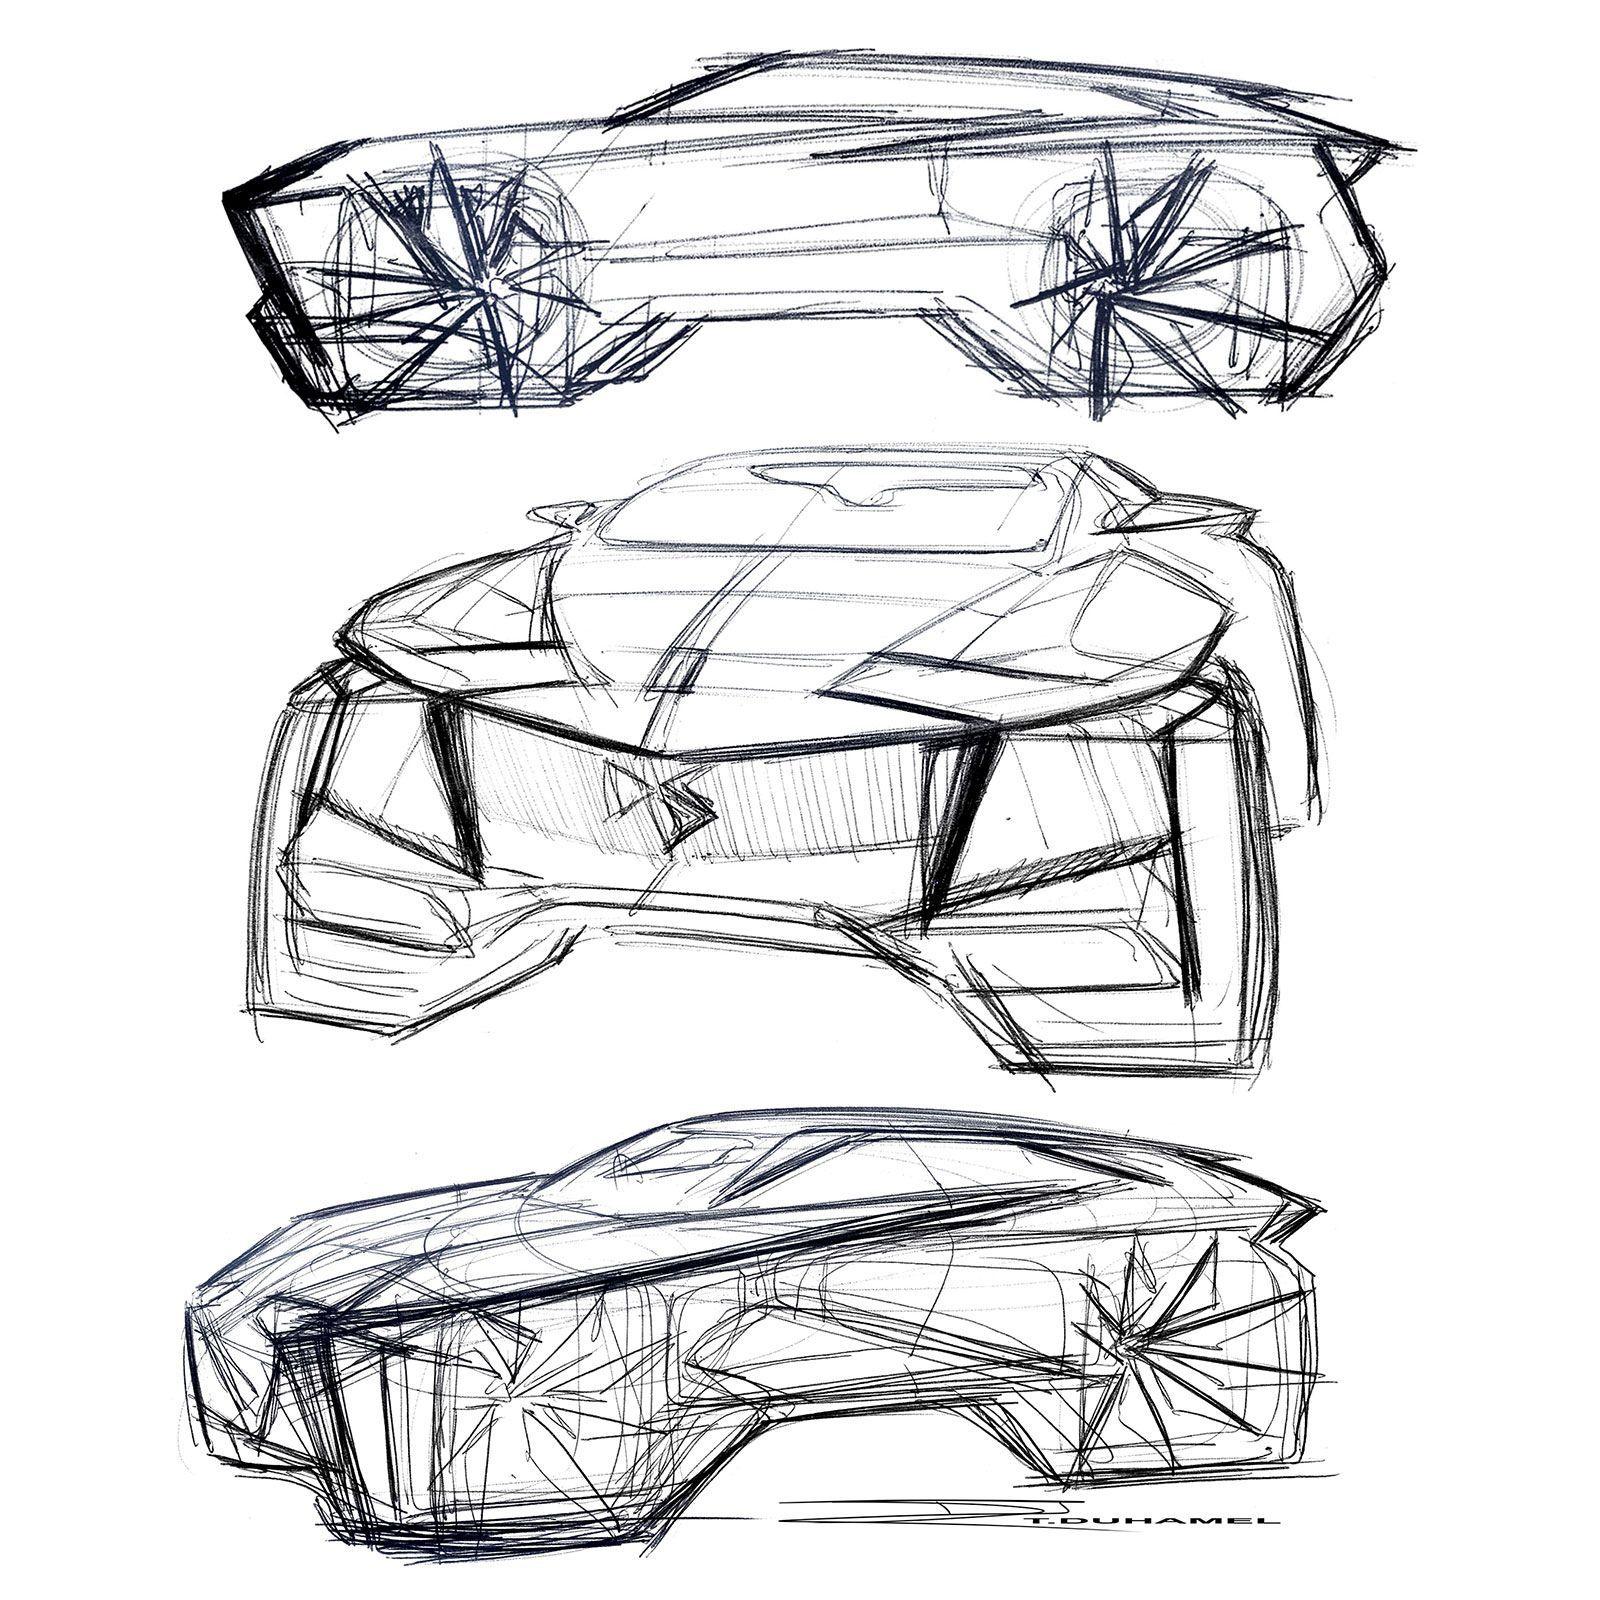 DS Aero Sport Lounge Concept: design sketches  #cardesign #automotivedesign #autodesign #cardesignworld #cardesignercommunity #cardesignpro #carbodydesign #cardesigner #vehicledesign #sketch #designsketch #carsketch #cardesignsketch #industrialdesignsketch #carrendering #conceptcar #conceptcars #cardesign #futuristiccars #design #futuristic #autodesign #automotive #car #cargram